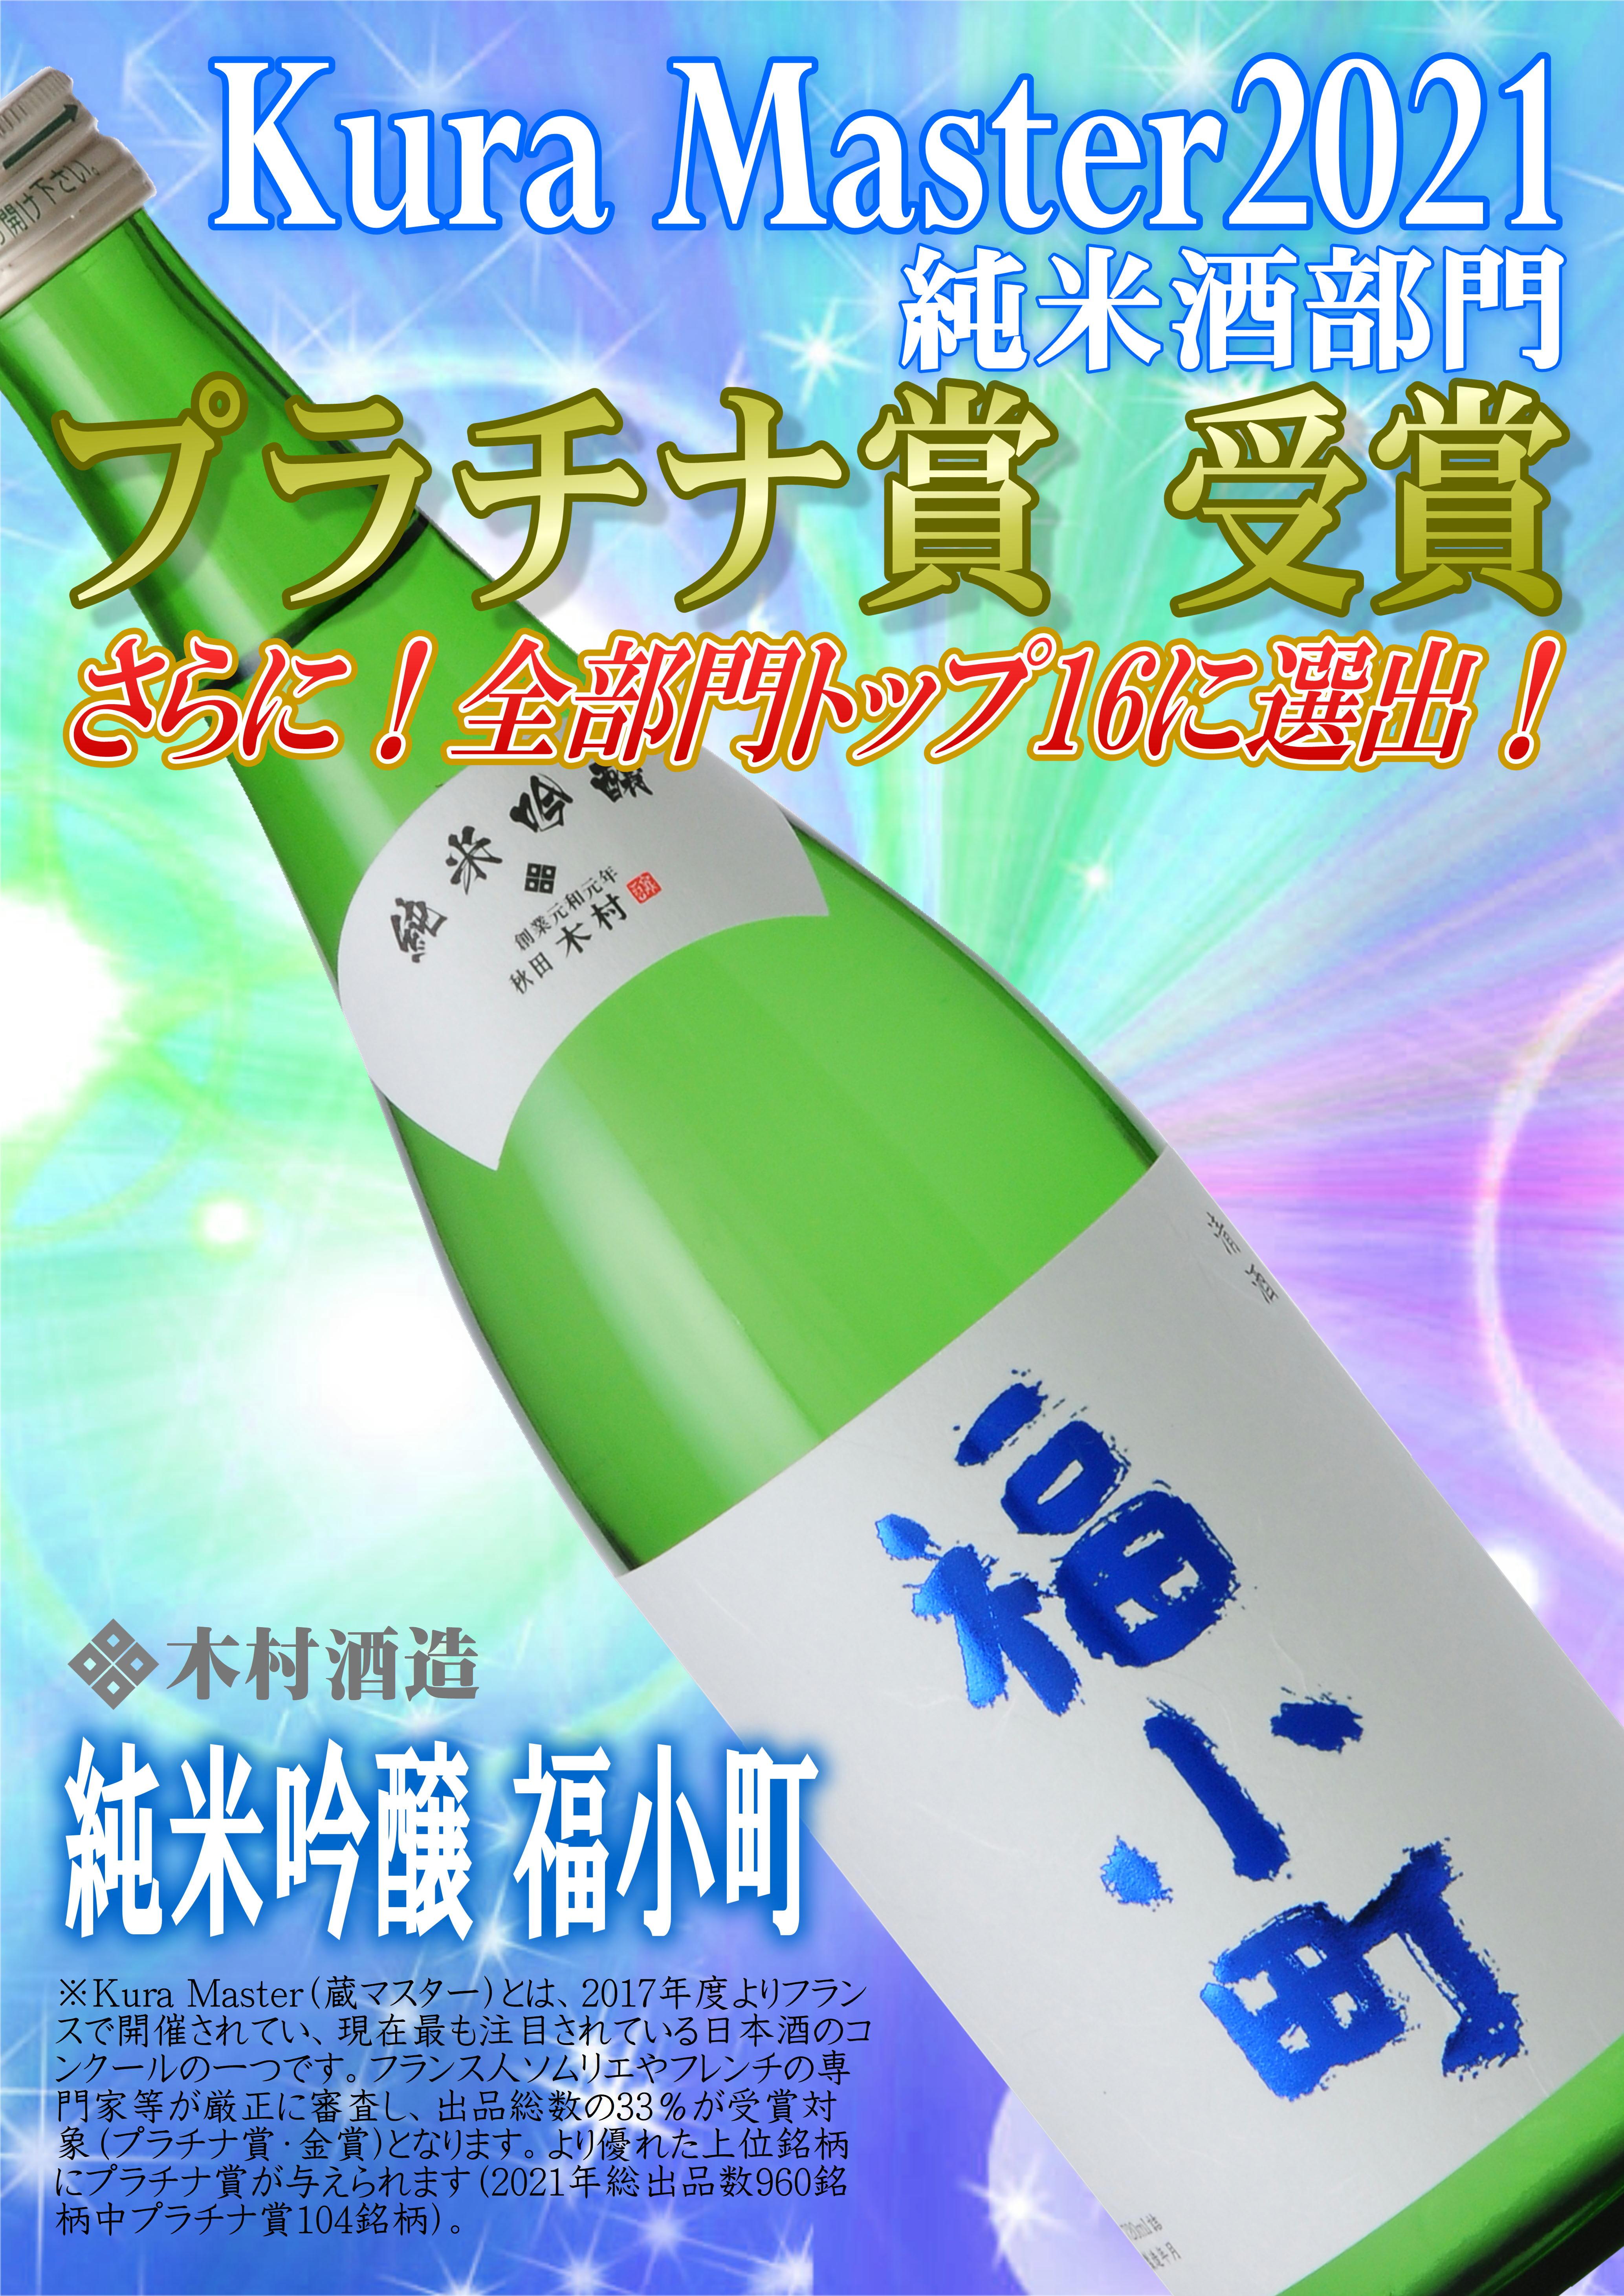 http://www.fukukomachi.com/blog/photo/20210728-2.JPG